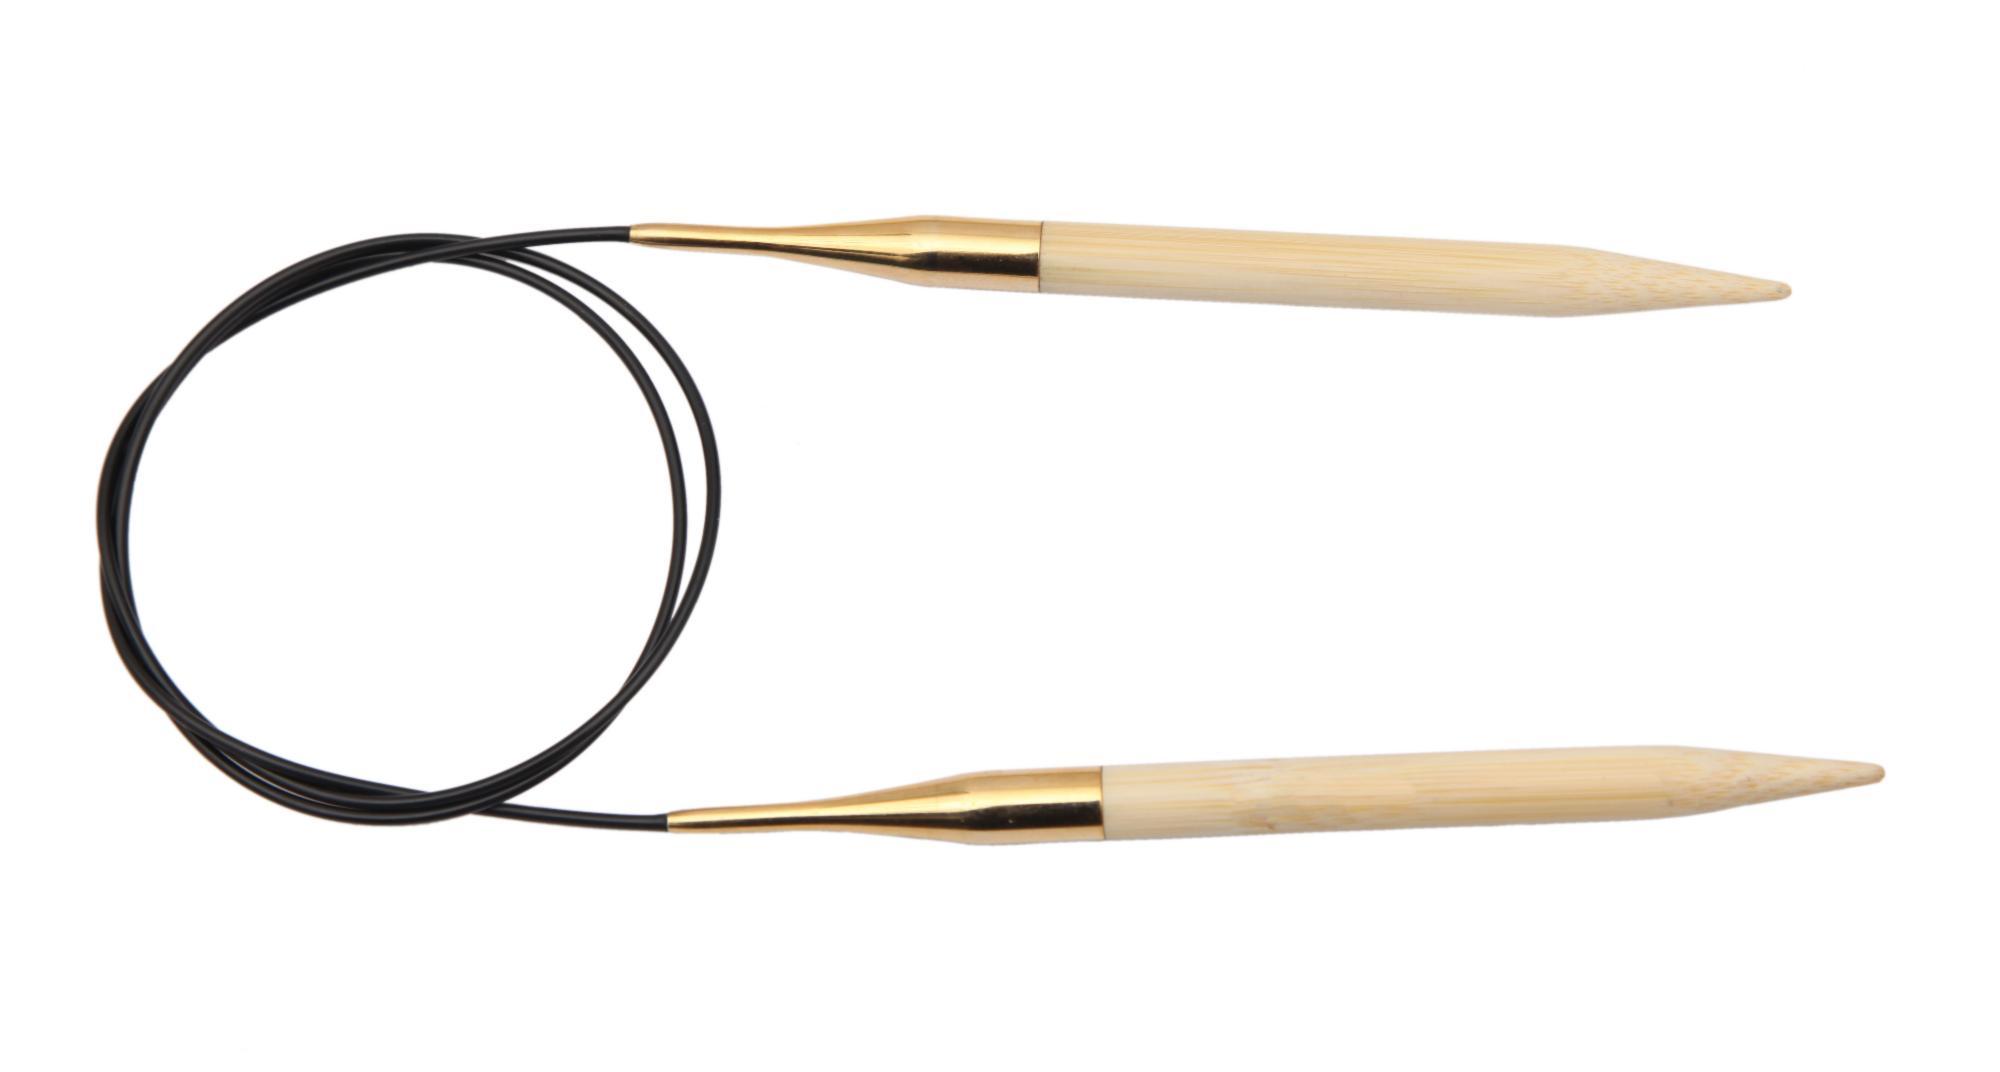 Спицы круговые 60 см Bamboo KnitPro, 22235, 9.00 мм